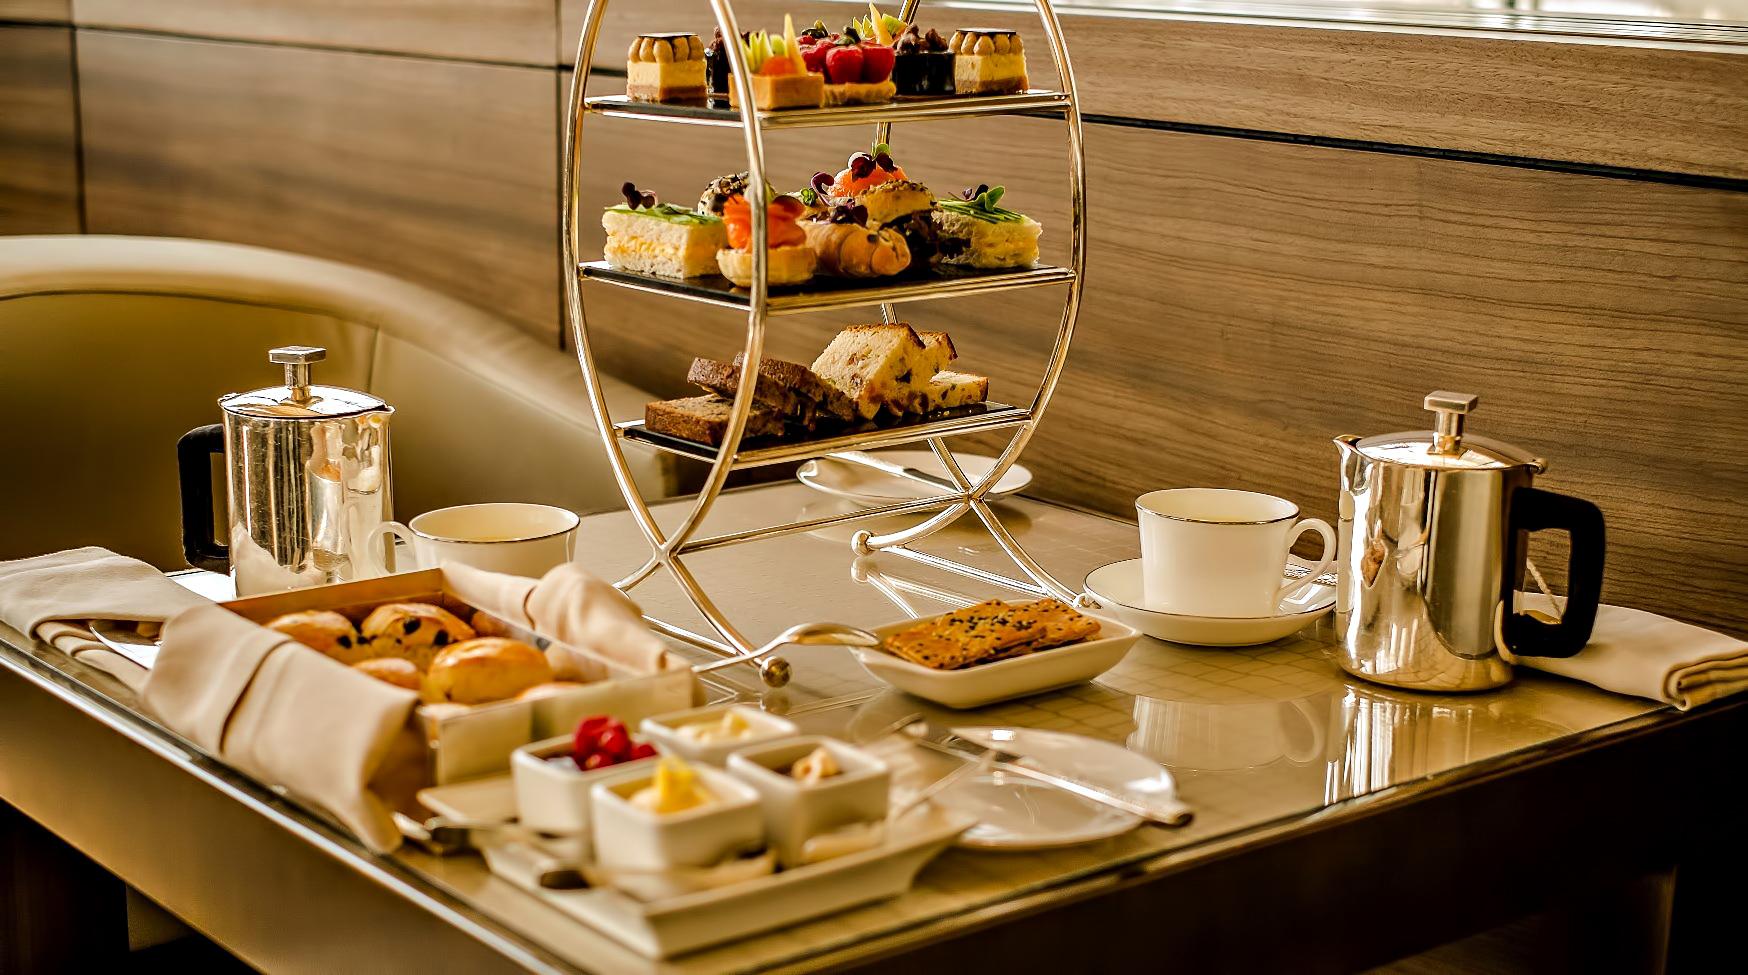 Armani Hotel Dubai – Burj Khalifa, Dubaï, Émirats arabes unis – Service à thé Armani